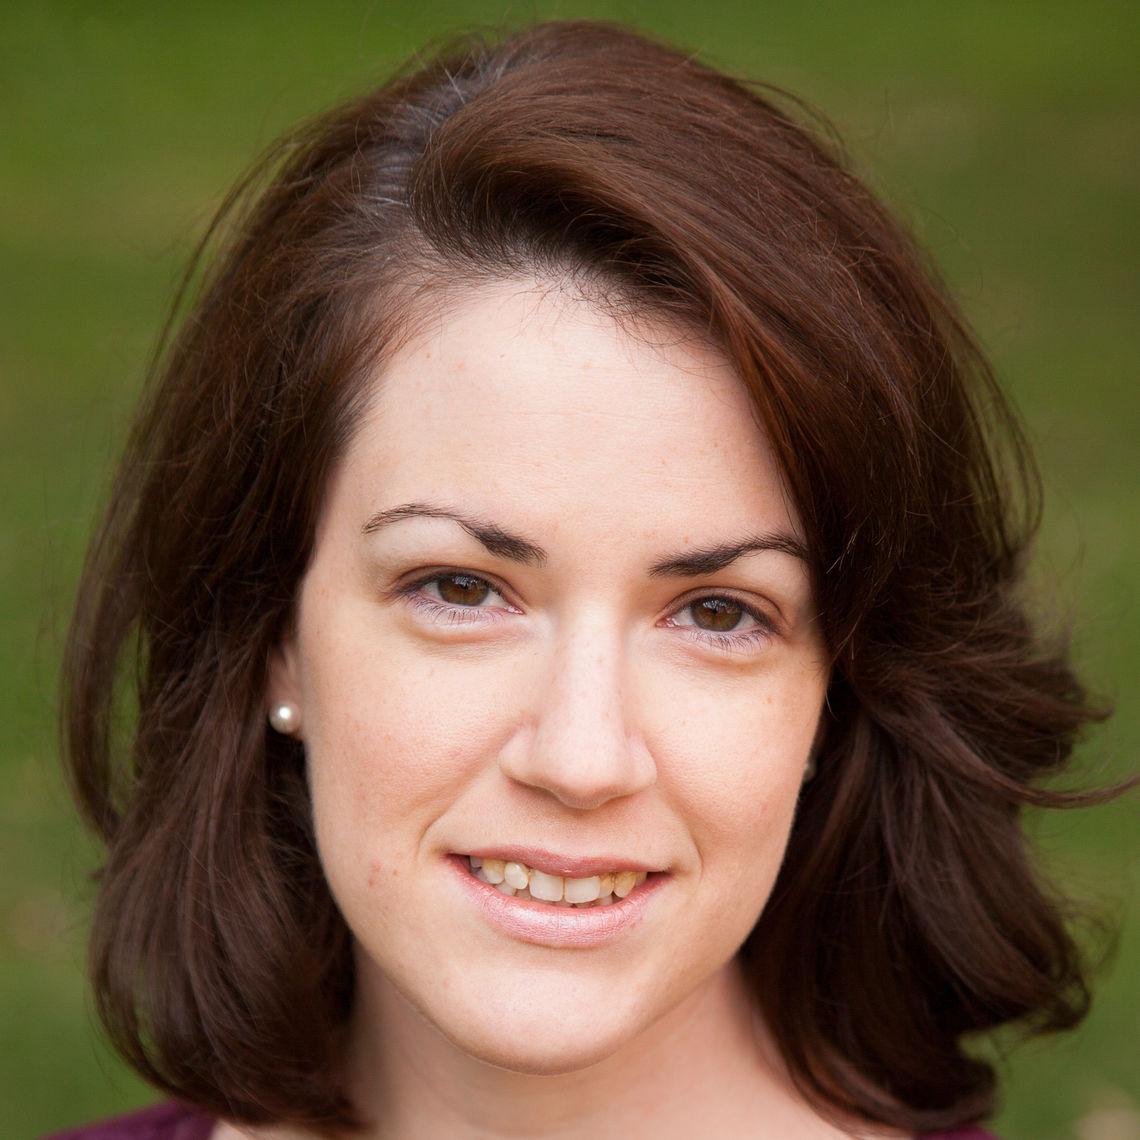 Megan Brandt